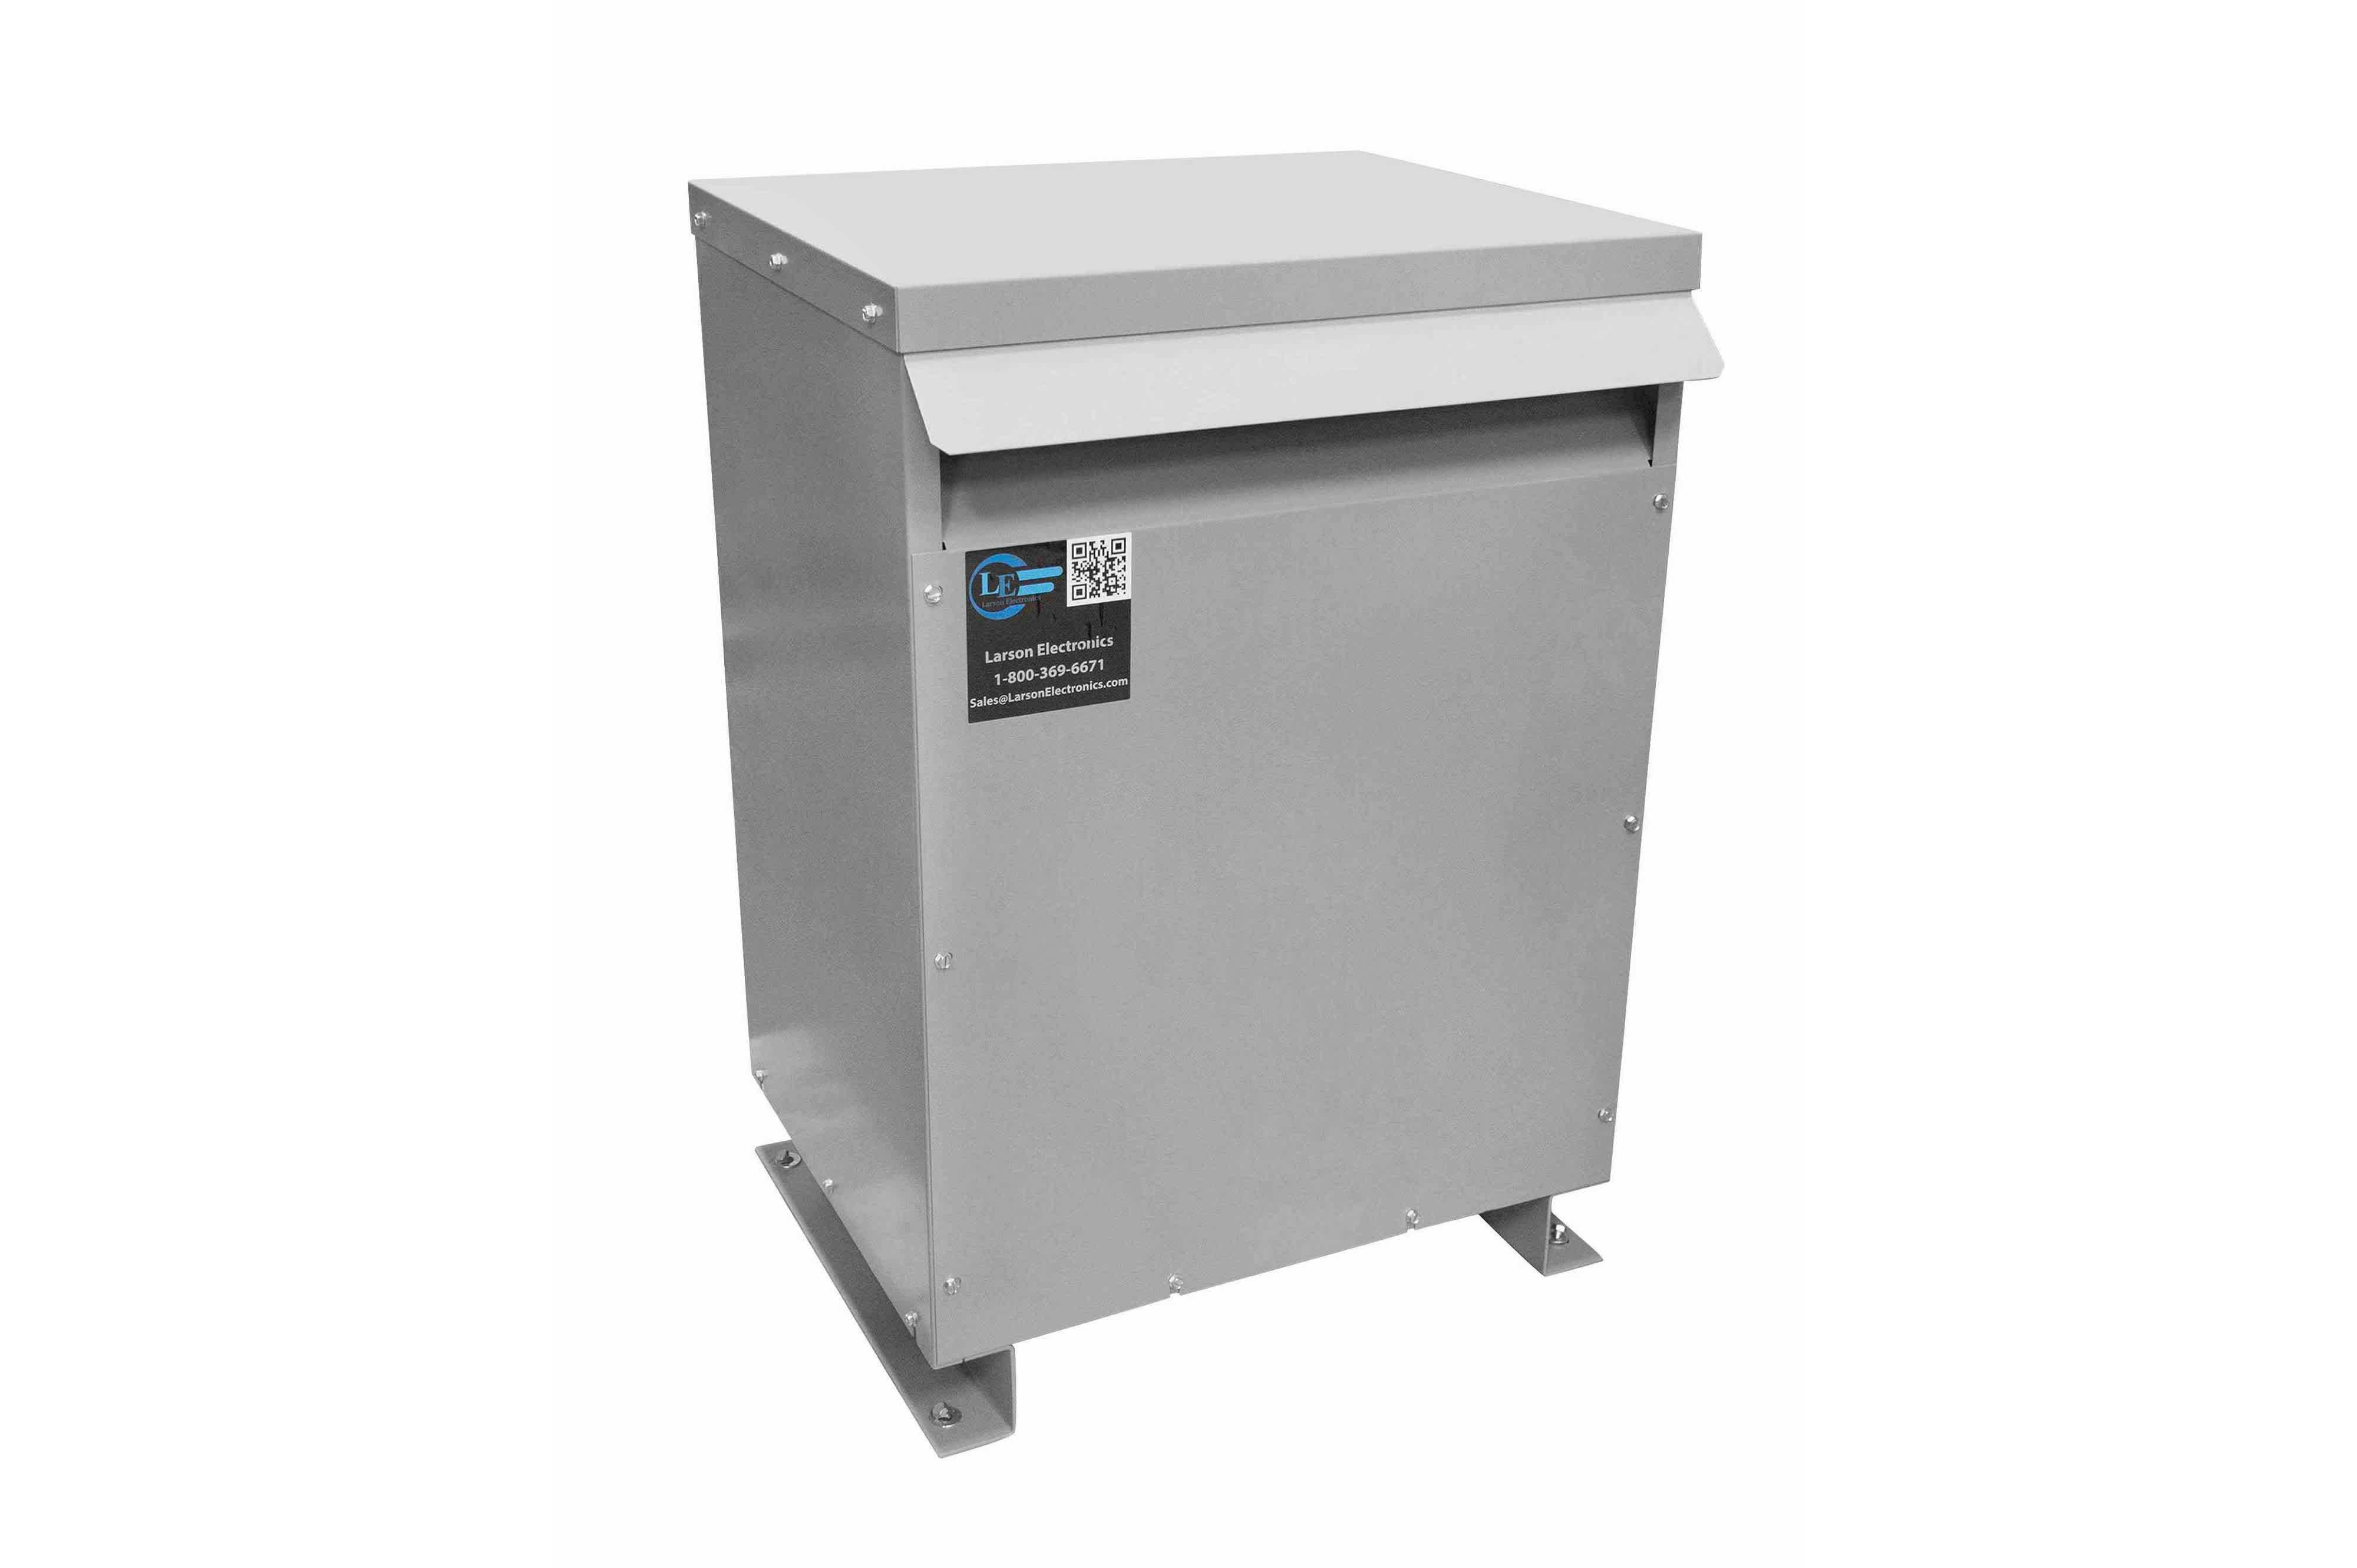 150 kVA 3PH Isolation Transformer, 600V Wye Primary, 480Y/277 Wye-N Secondary, N3R, Ventilated, 60 Hz